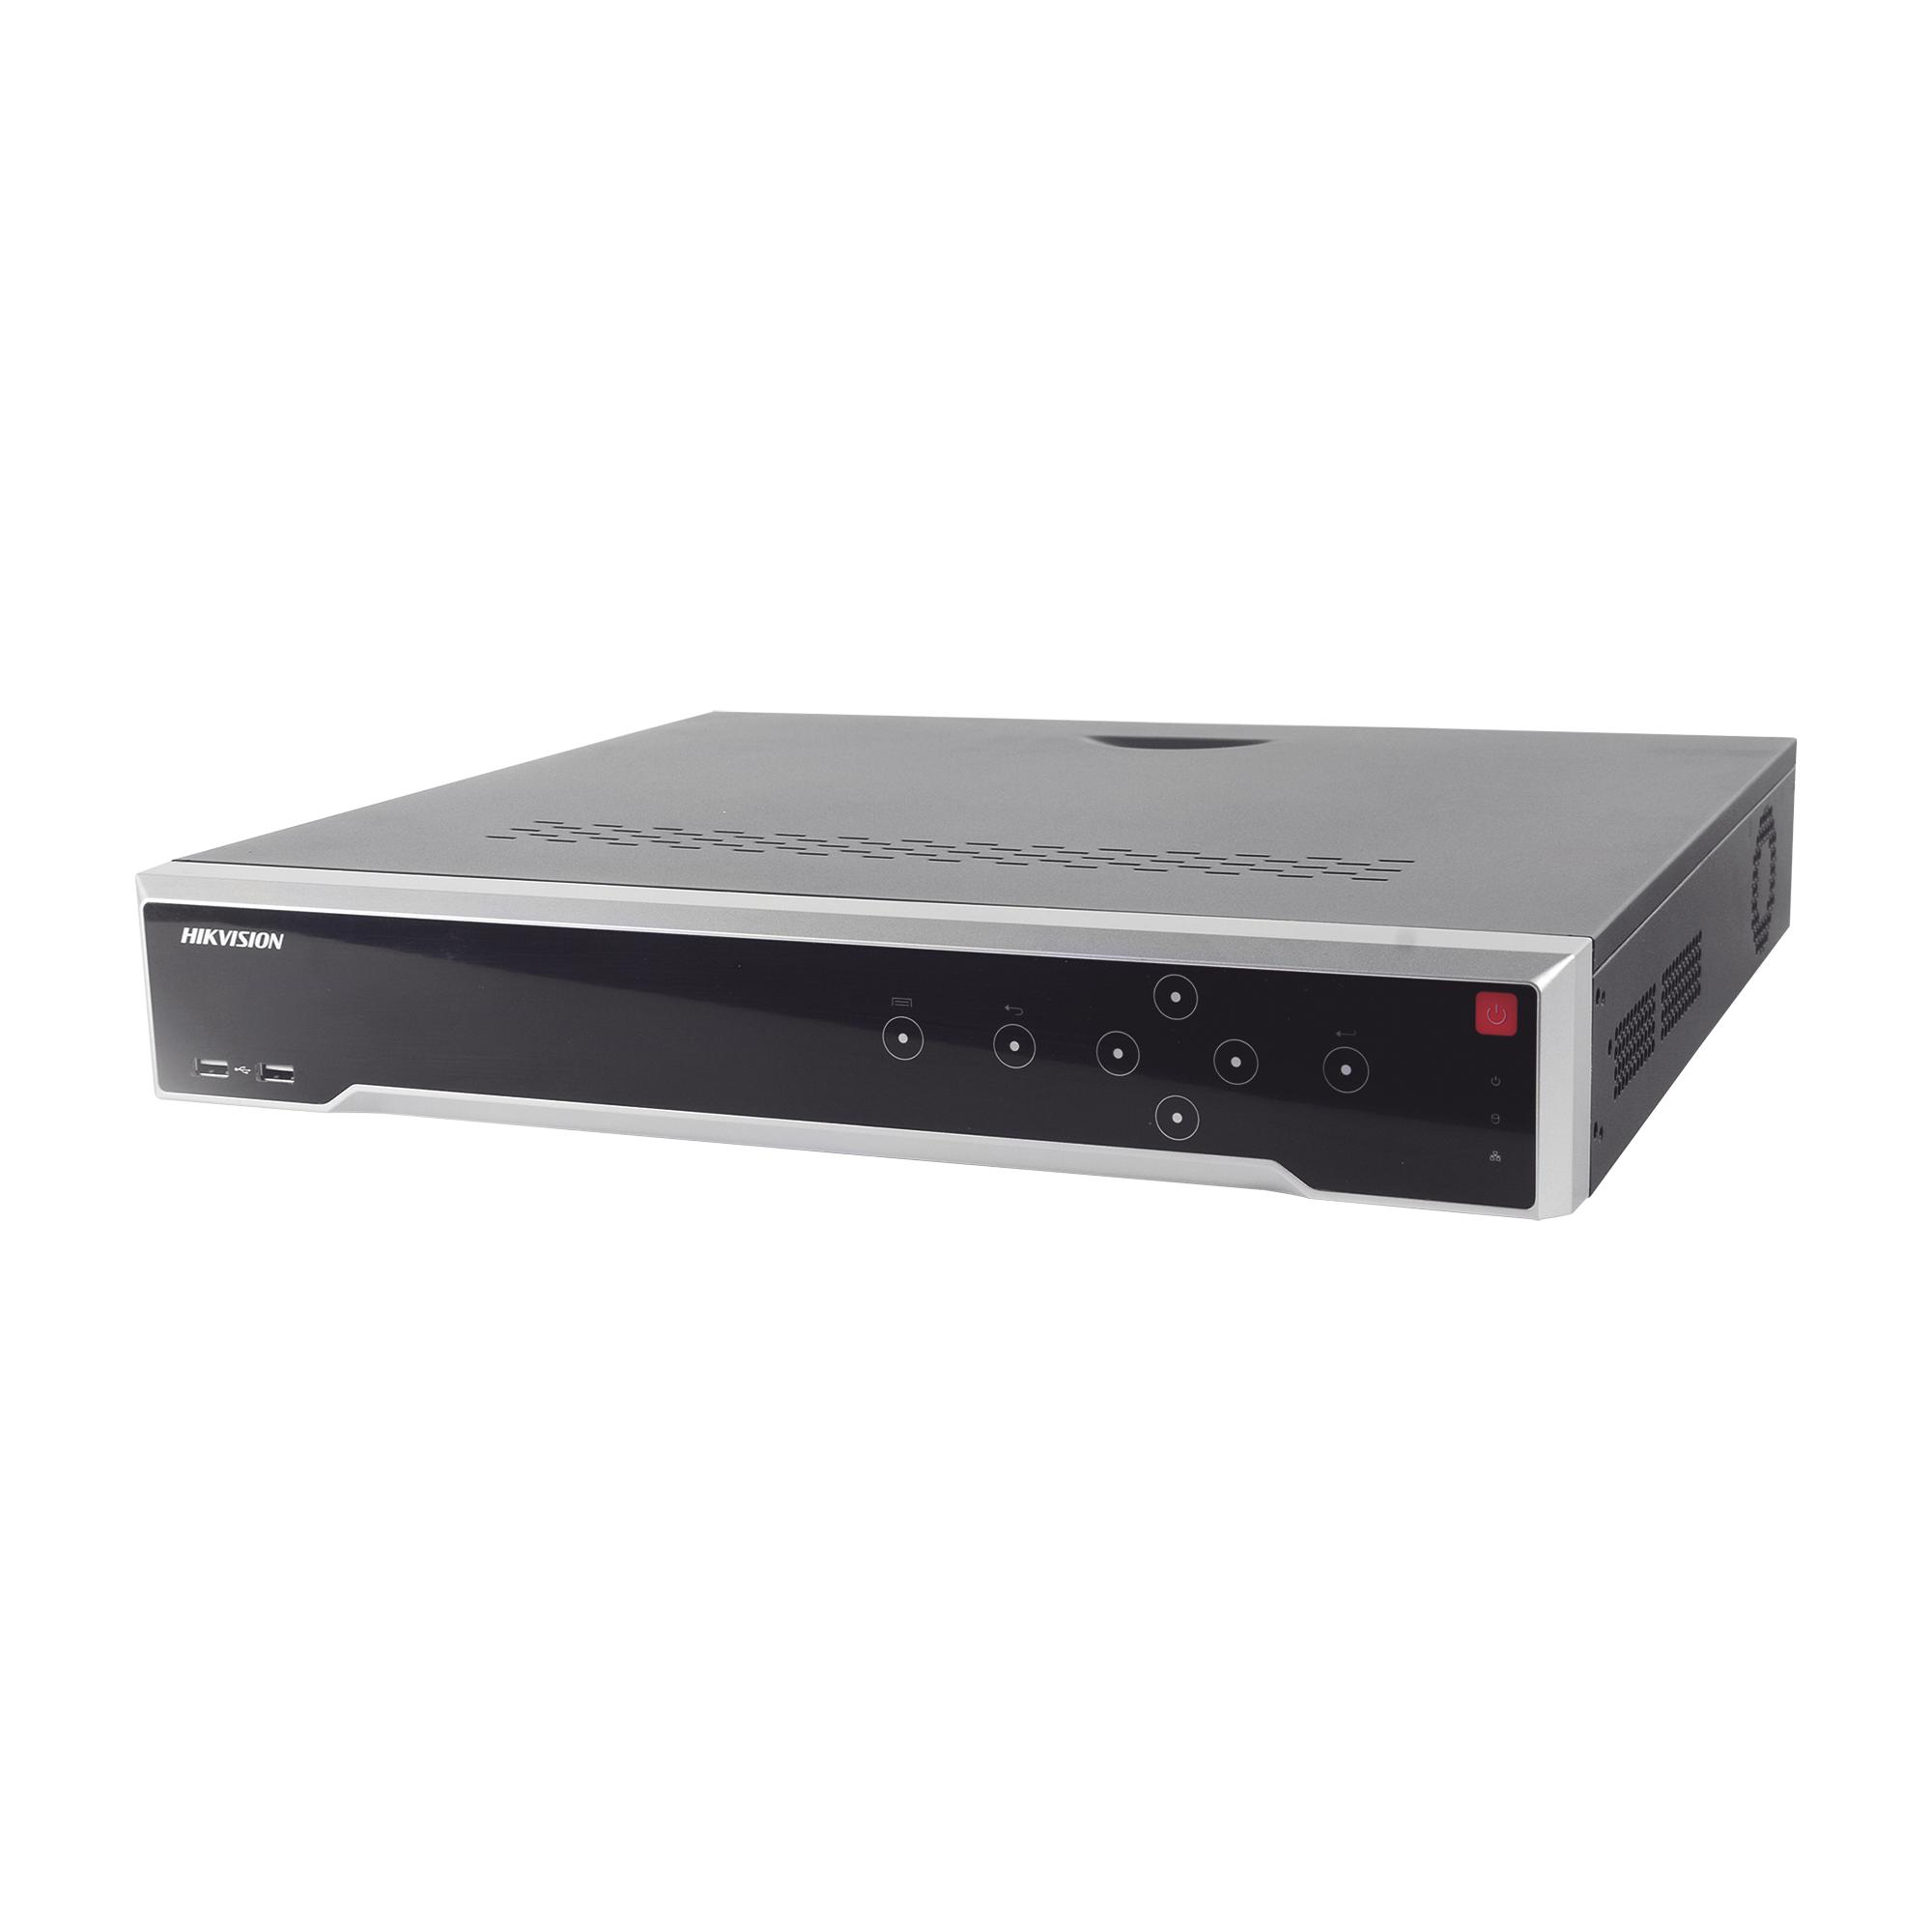 NVR 8 Megapixel (4K) / 16 canales IP /16 Puertos PoE+ / 4 Bahías de Disco Duro / Switch PoE 300 mts / HDMI en 4K